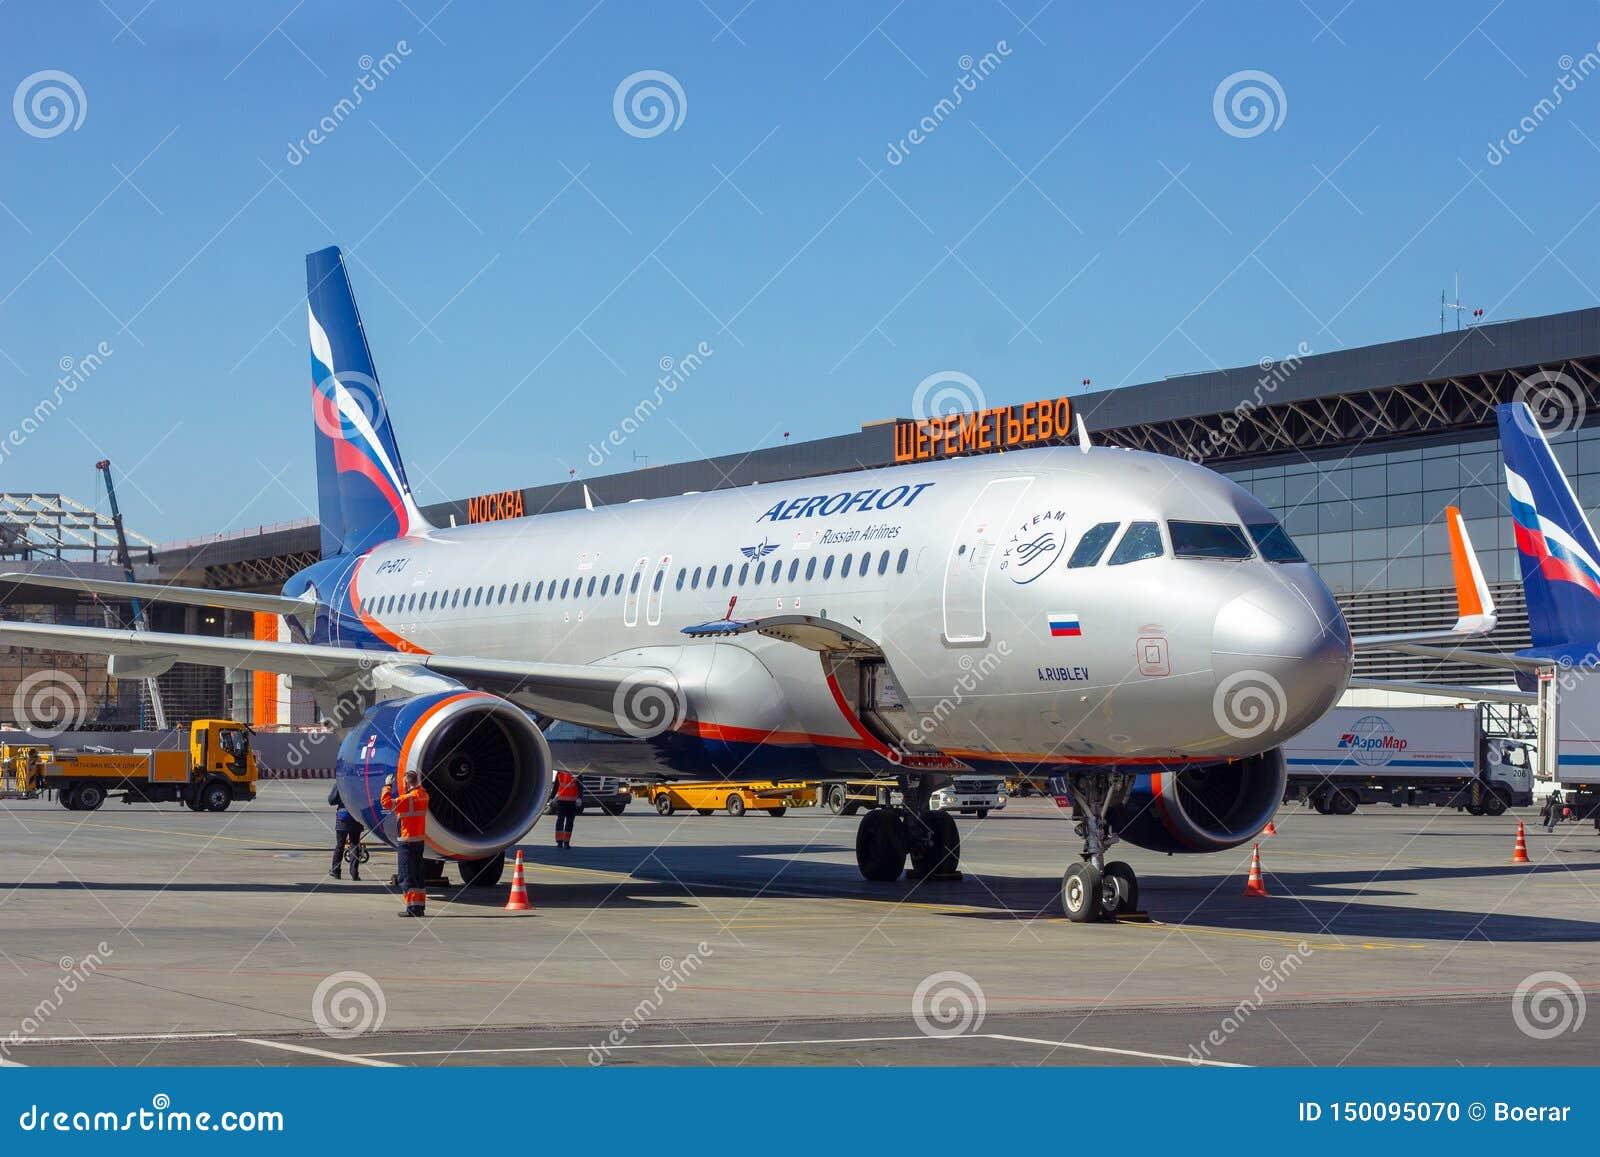 SHEREMETYEVO, MOSCOW REGION, RUSSIA - APRIL 28, 2019: Aeroflot airlines flight airplane awaits boarding passengers in Sheremetyevo